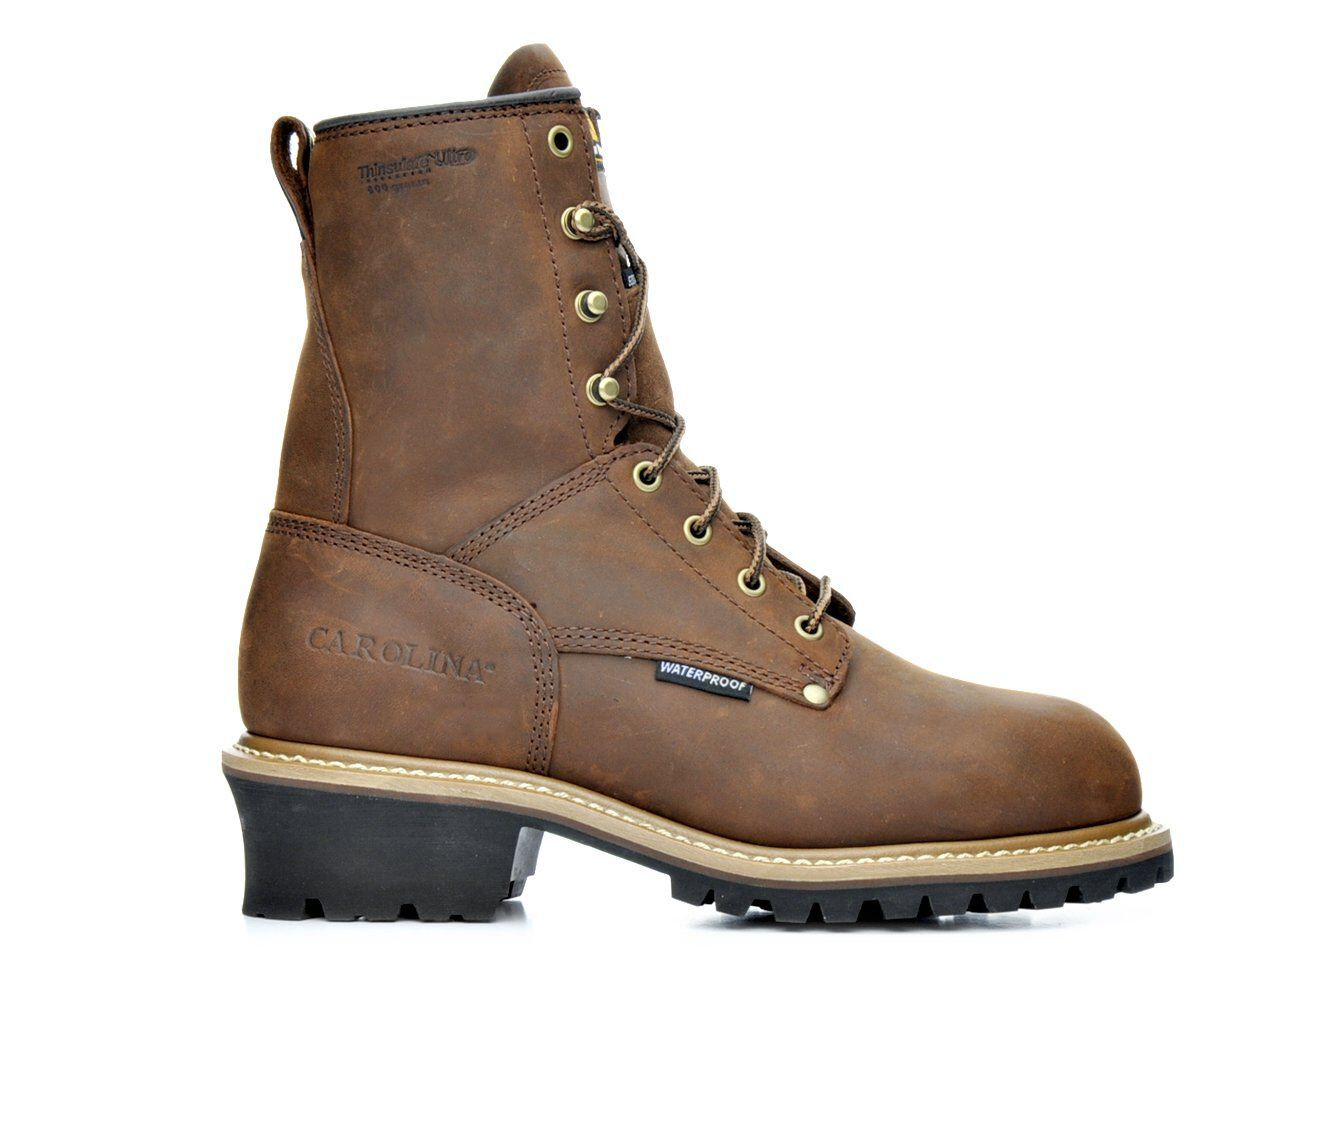 Men's Carolina Boots CA5821 8 In Steel Toe Insulated Logging Work Boots Dark Brown